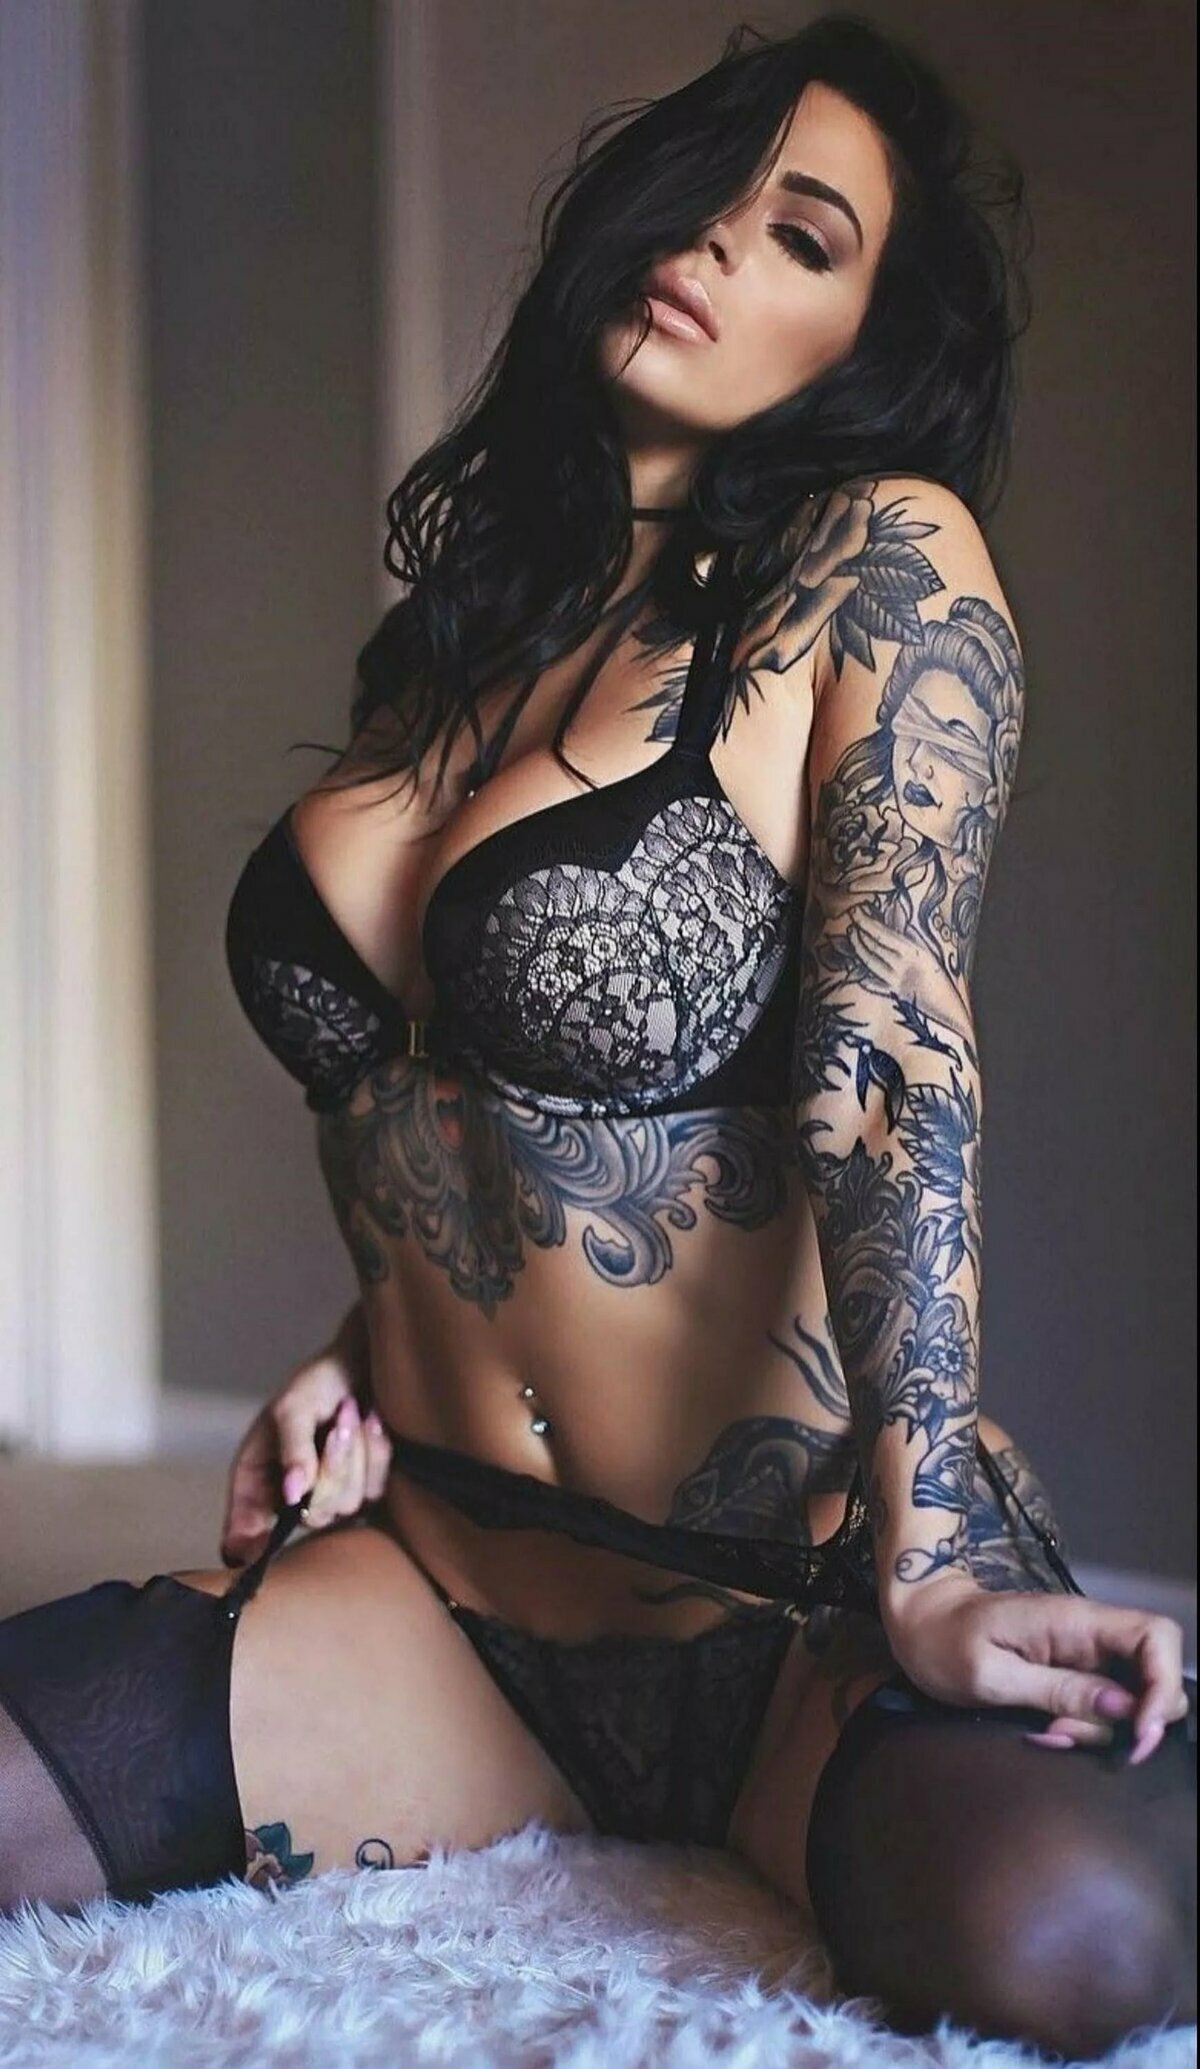 Nude Tattoed Girls